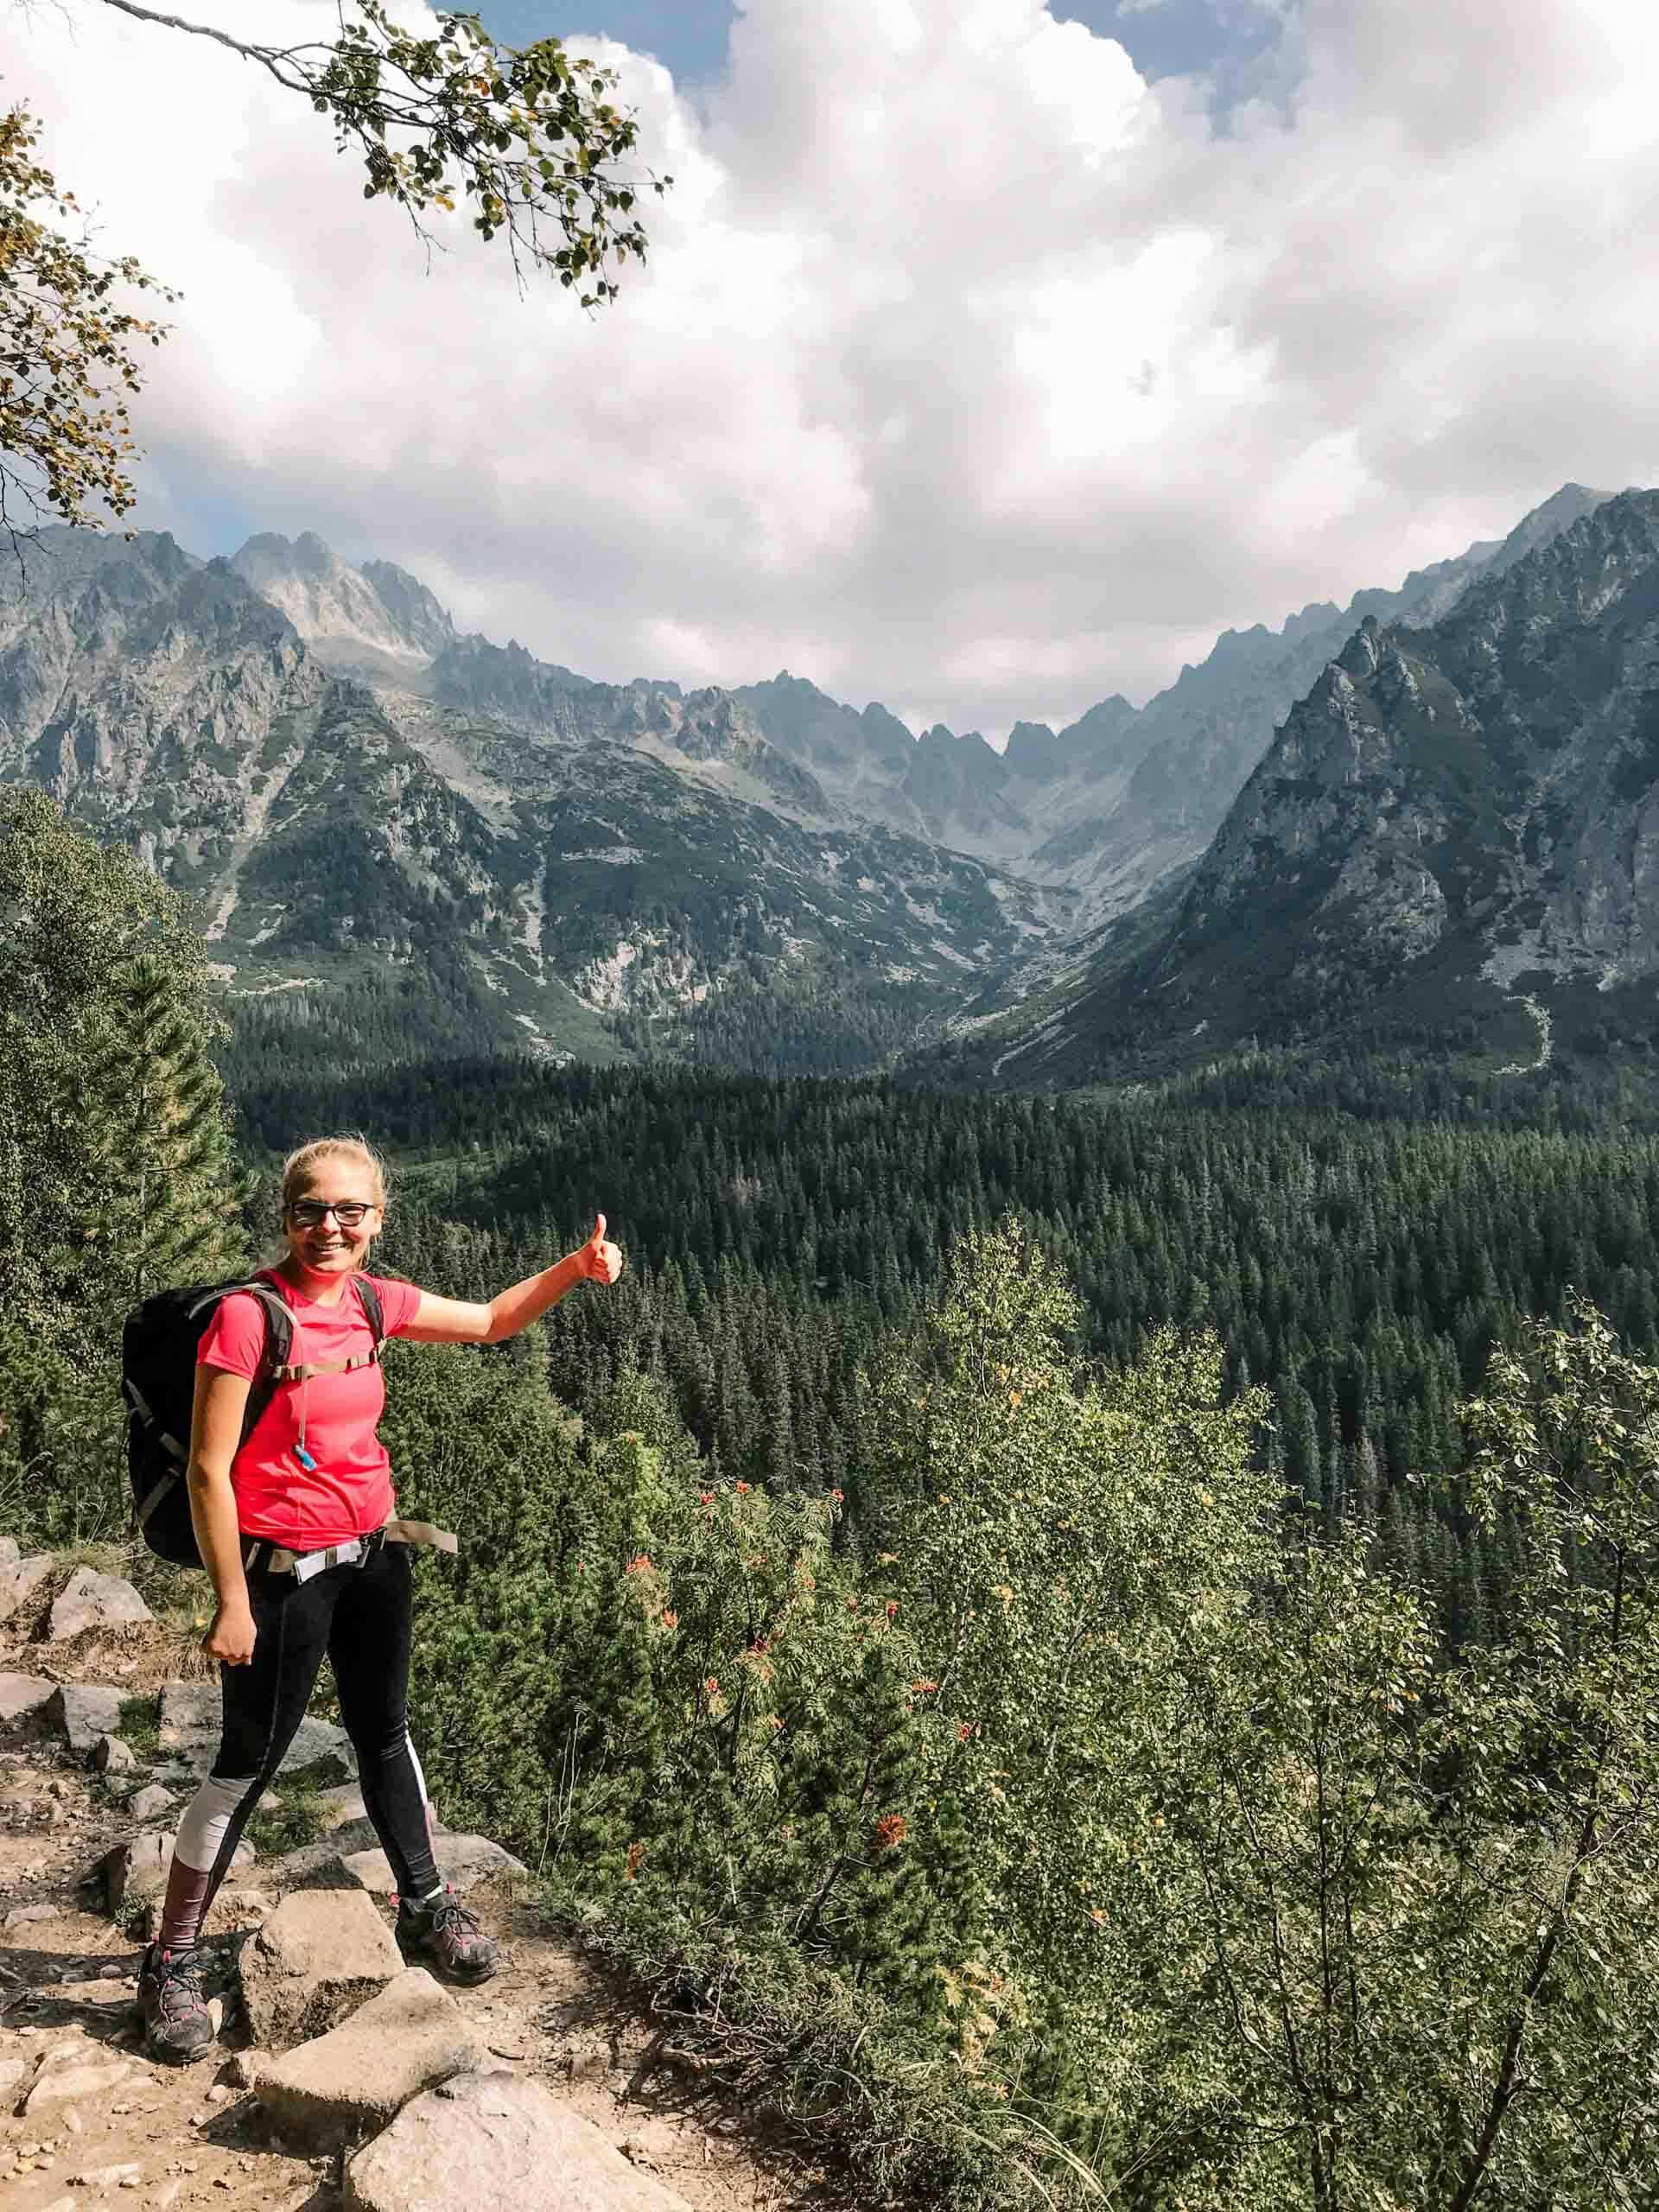 Rysy - Vysoké Tatry - Jiráci na cestách